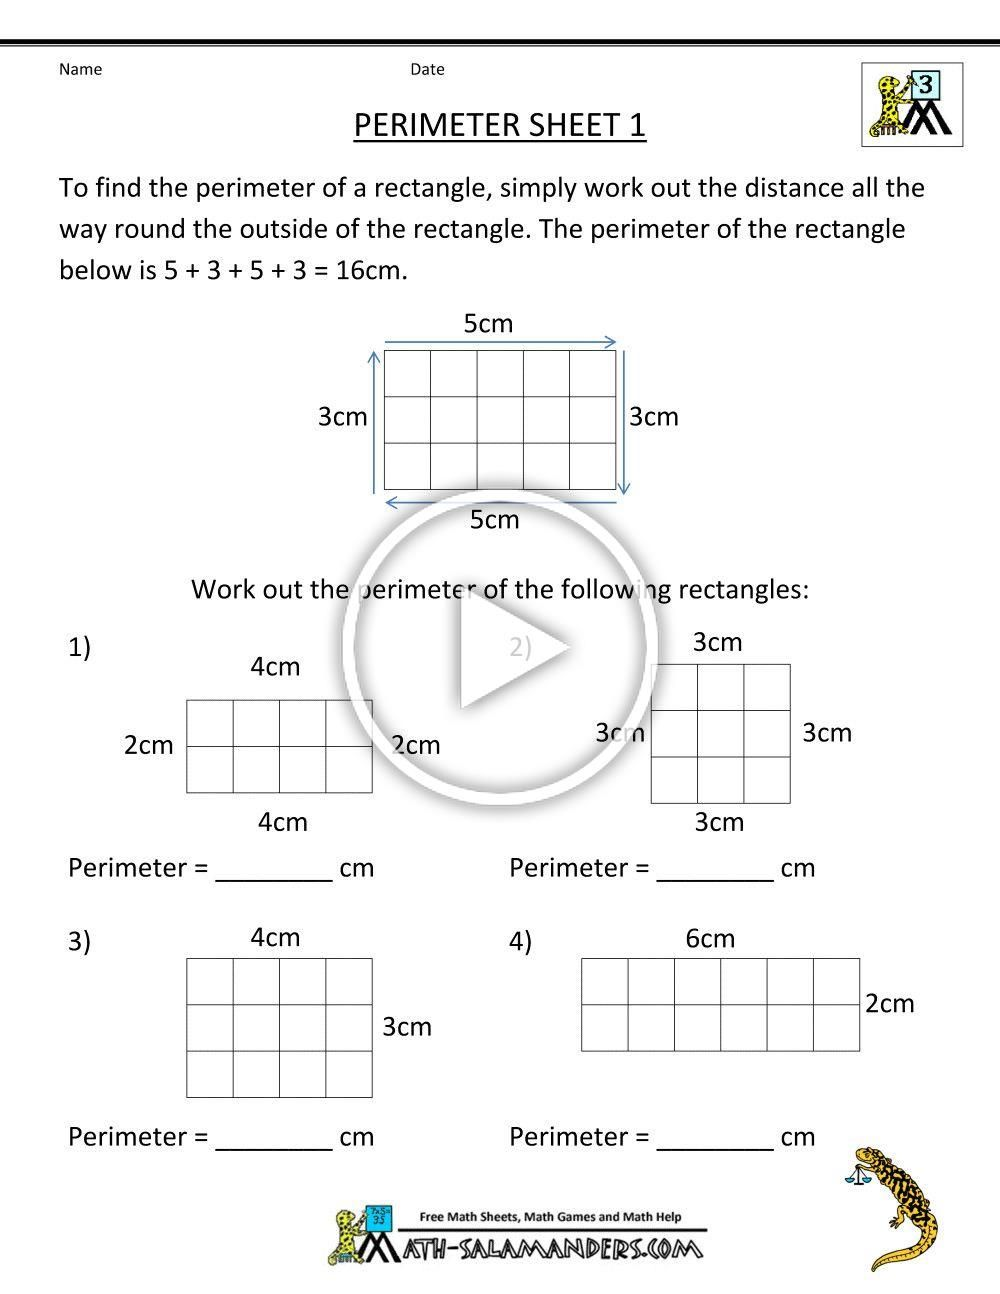 2 Capacity Worksheets Grade 2 free 3rd grade math worksheets perimeter 1 √  Capacity Worksheets Grade 2 . 2 Capacity Worksheets Grade 2 . Inches  Measurement Work… in 2020 [ 1294 x 1000 Pixel ]